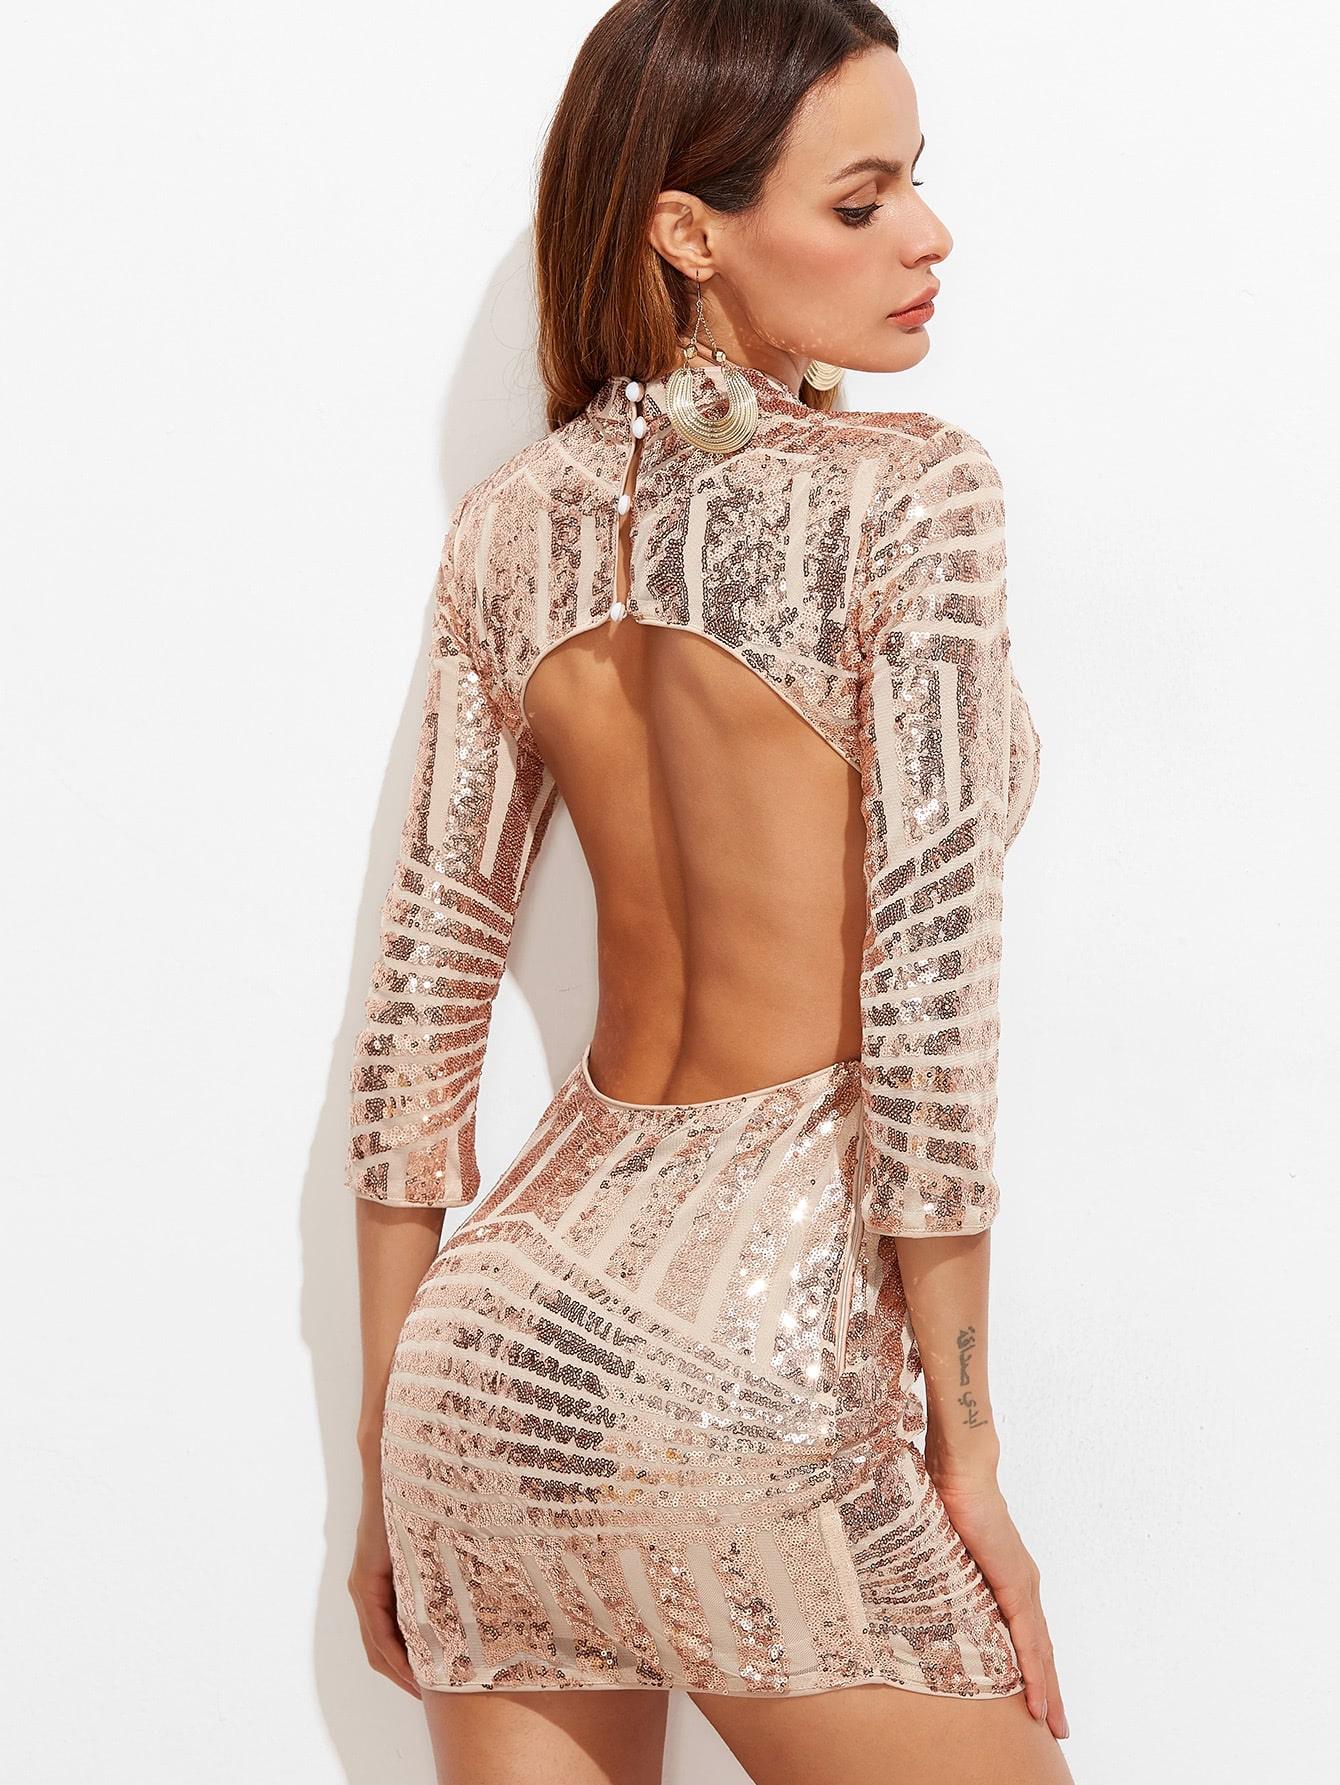 Pink Mock Neck 3/4 Sleeve Open Back Geo Sequin Dress dress161206713